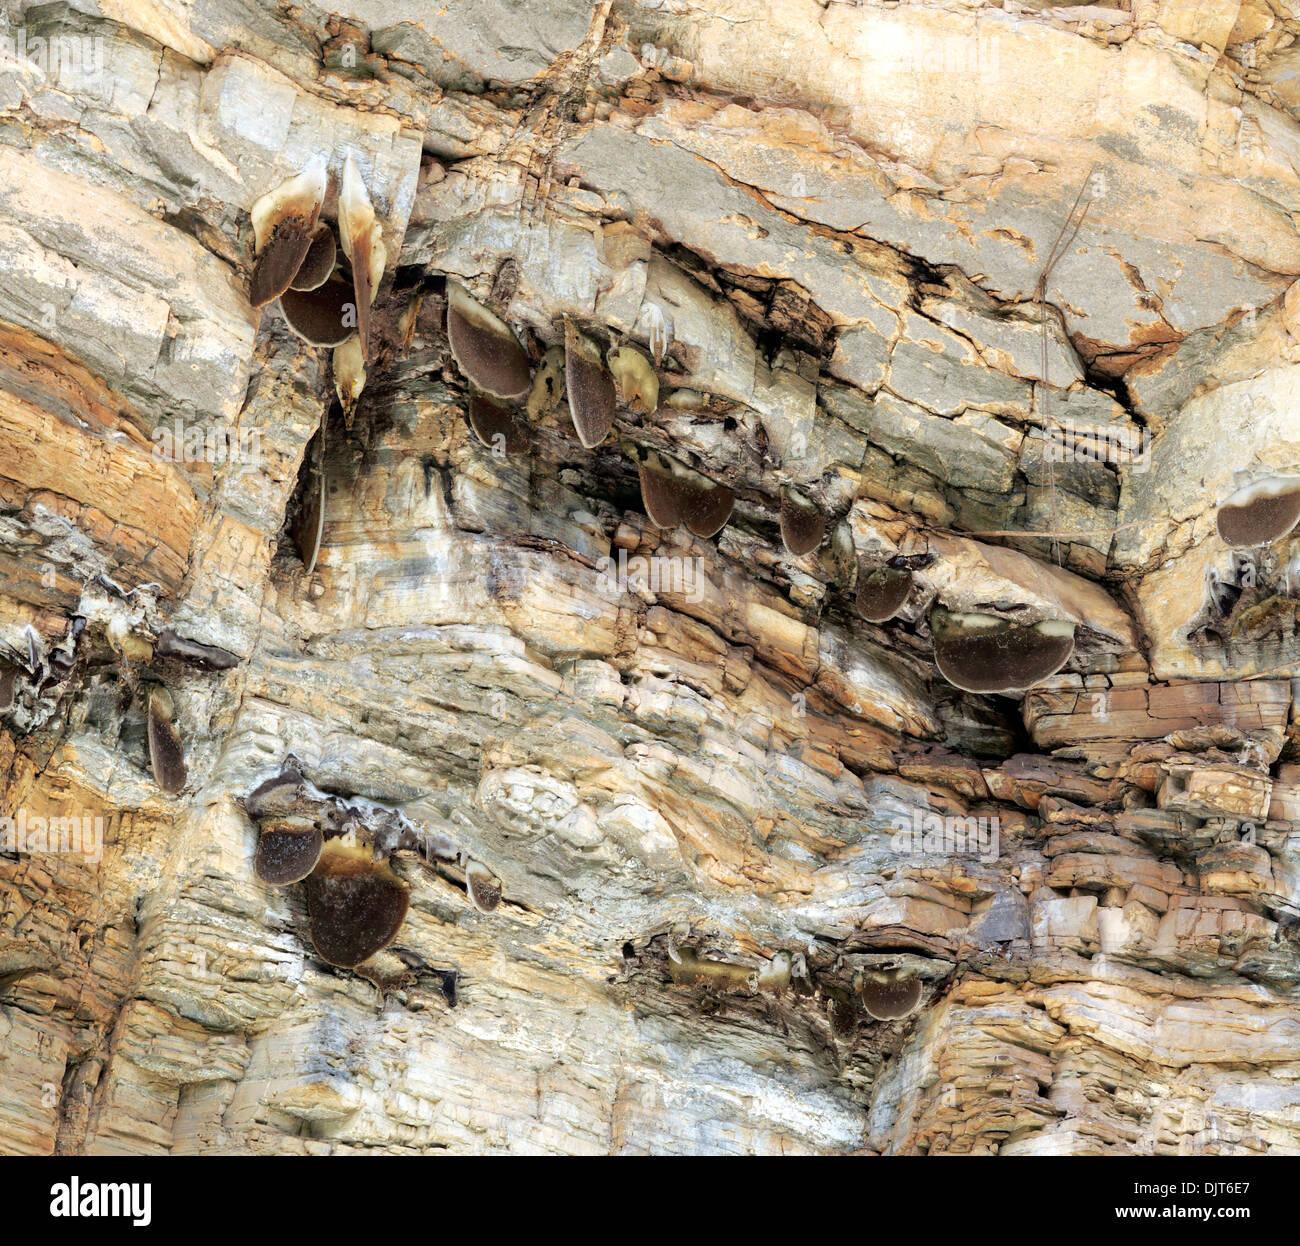 Colony of wild bees, Araniko Highway, Kathmandu Valley, Nepal - Stock Image